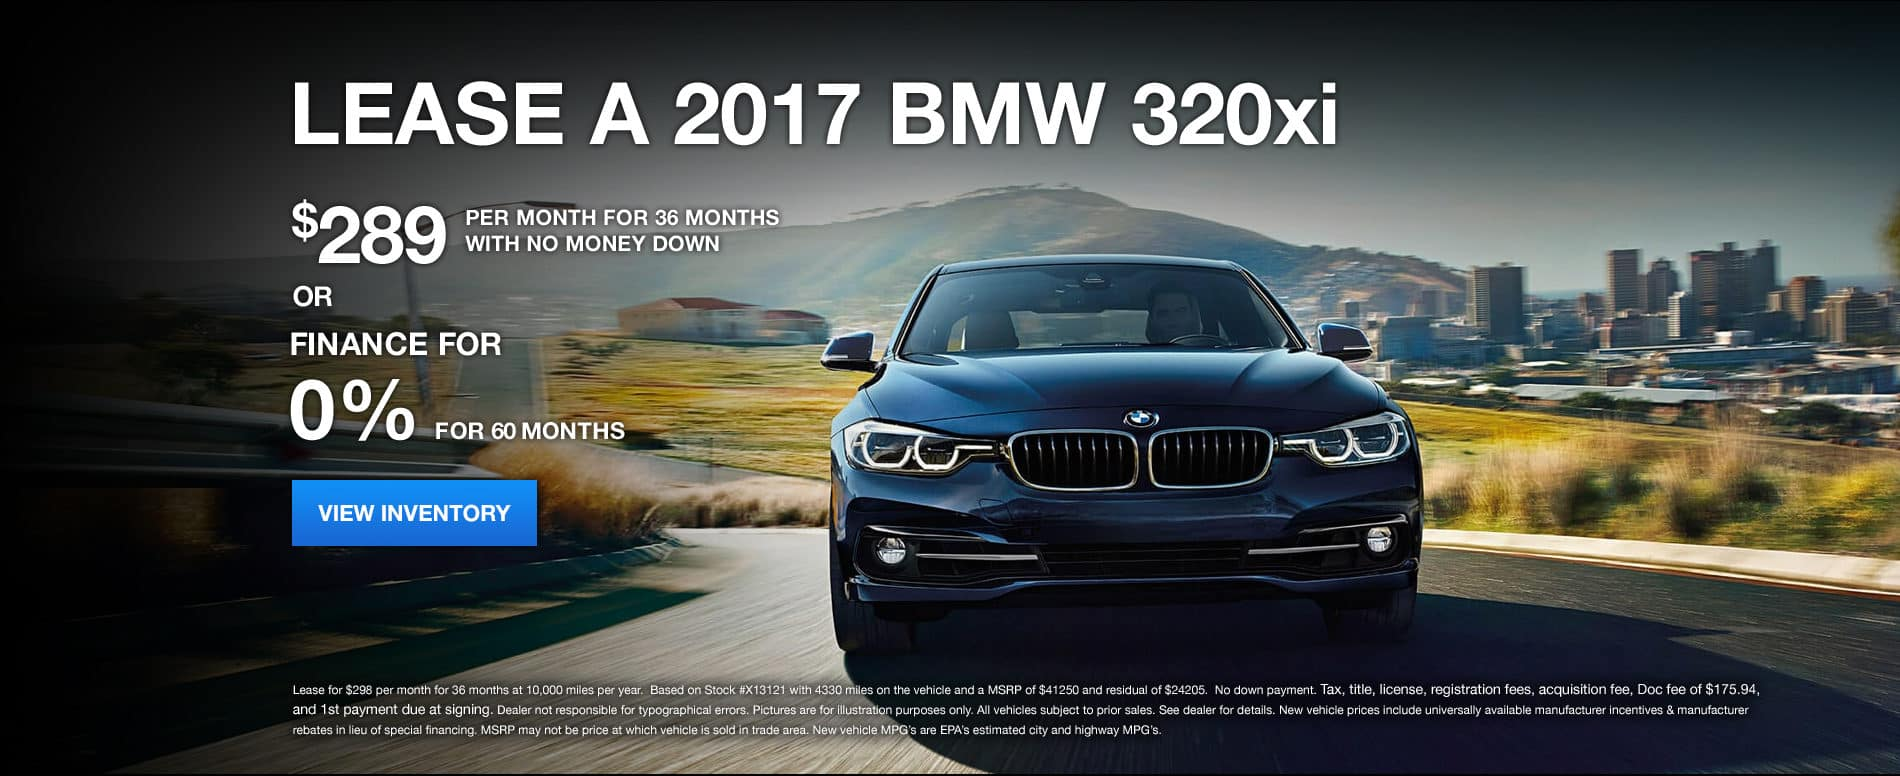 320xi January Offer Bill Jacobs BMW